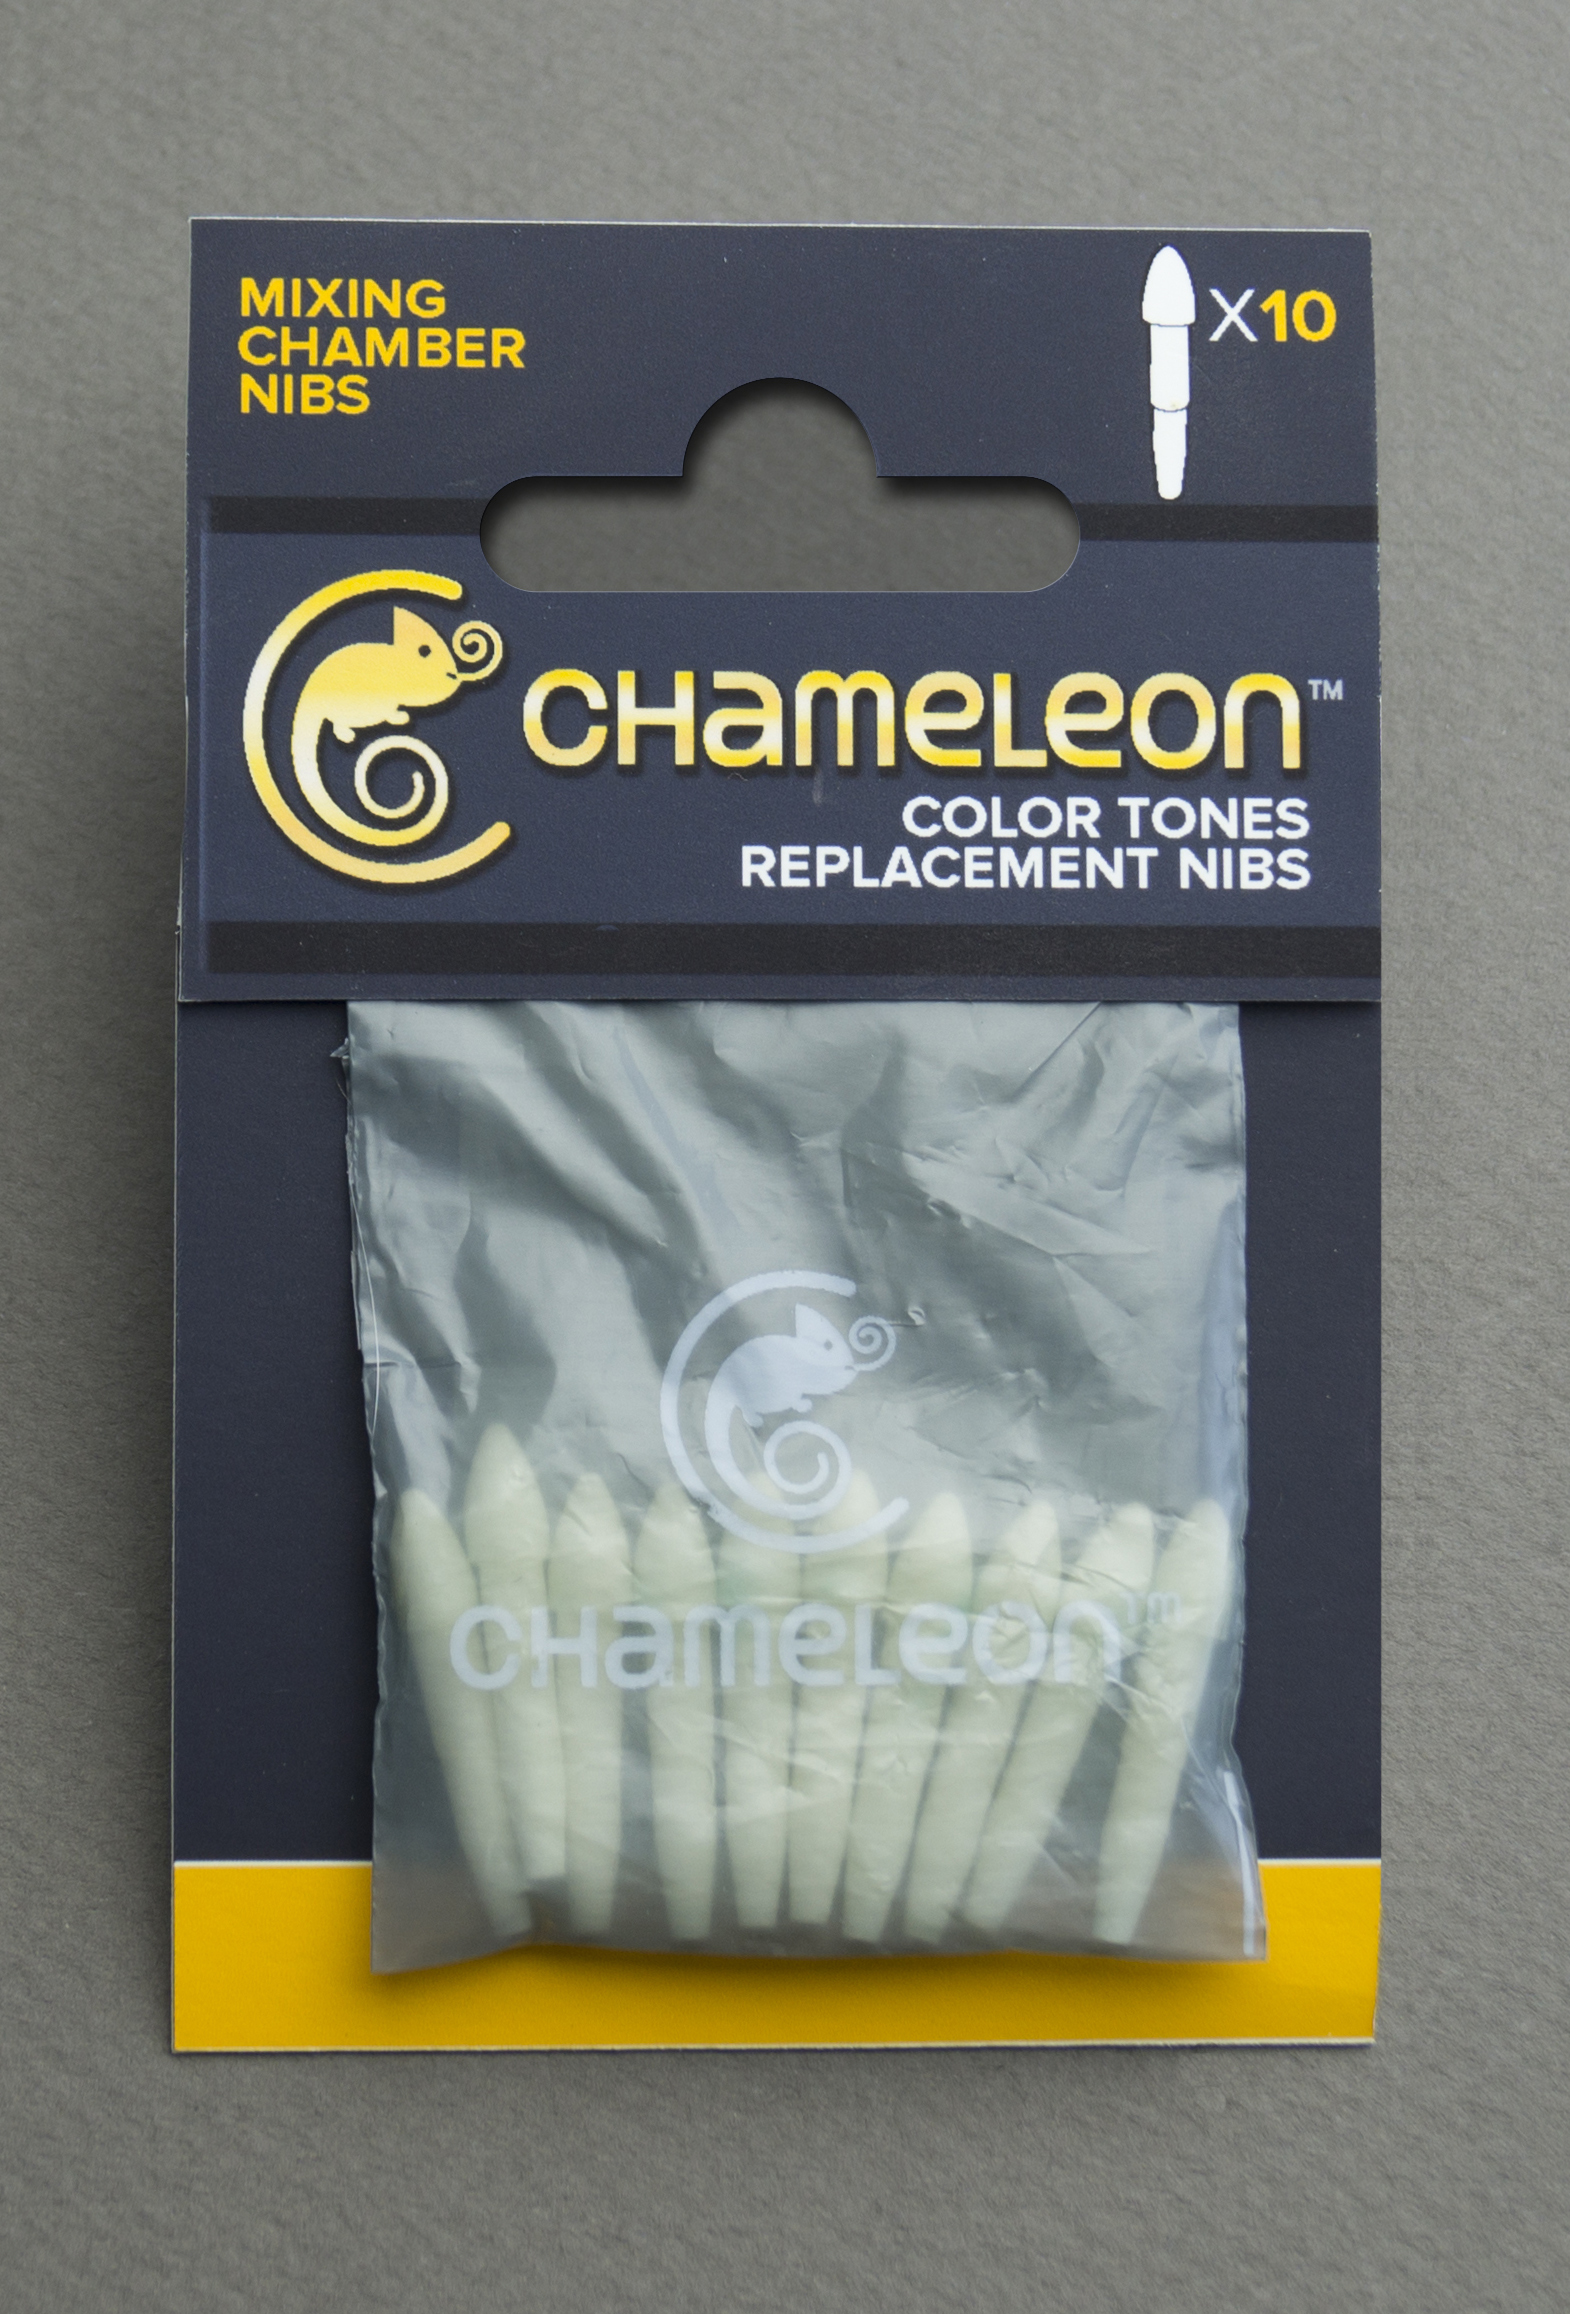 Chameleon Pen Replacement Mixing Chamber Nib (カメレオンペン 交換用ミキシングニブ)